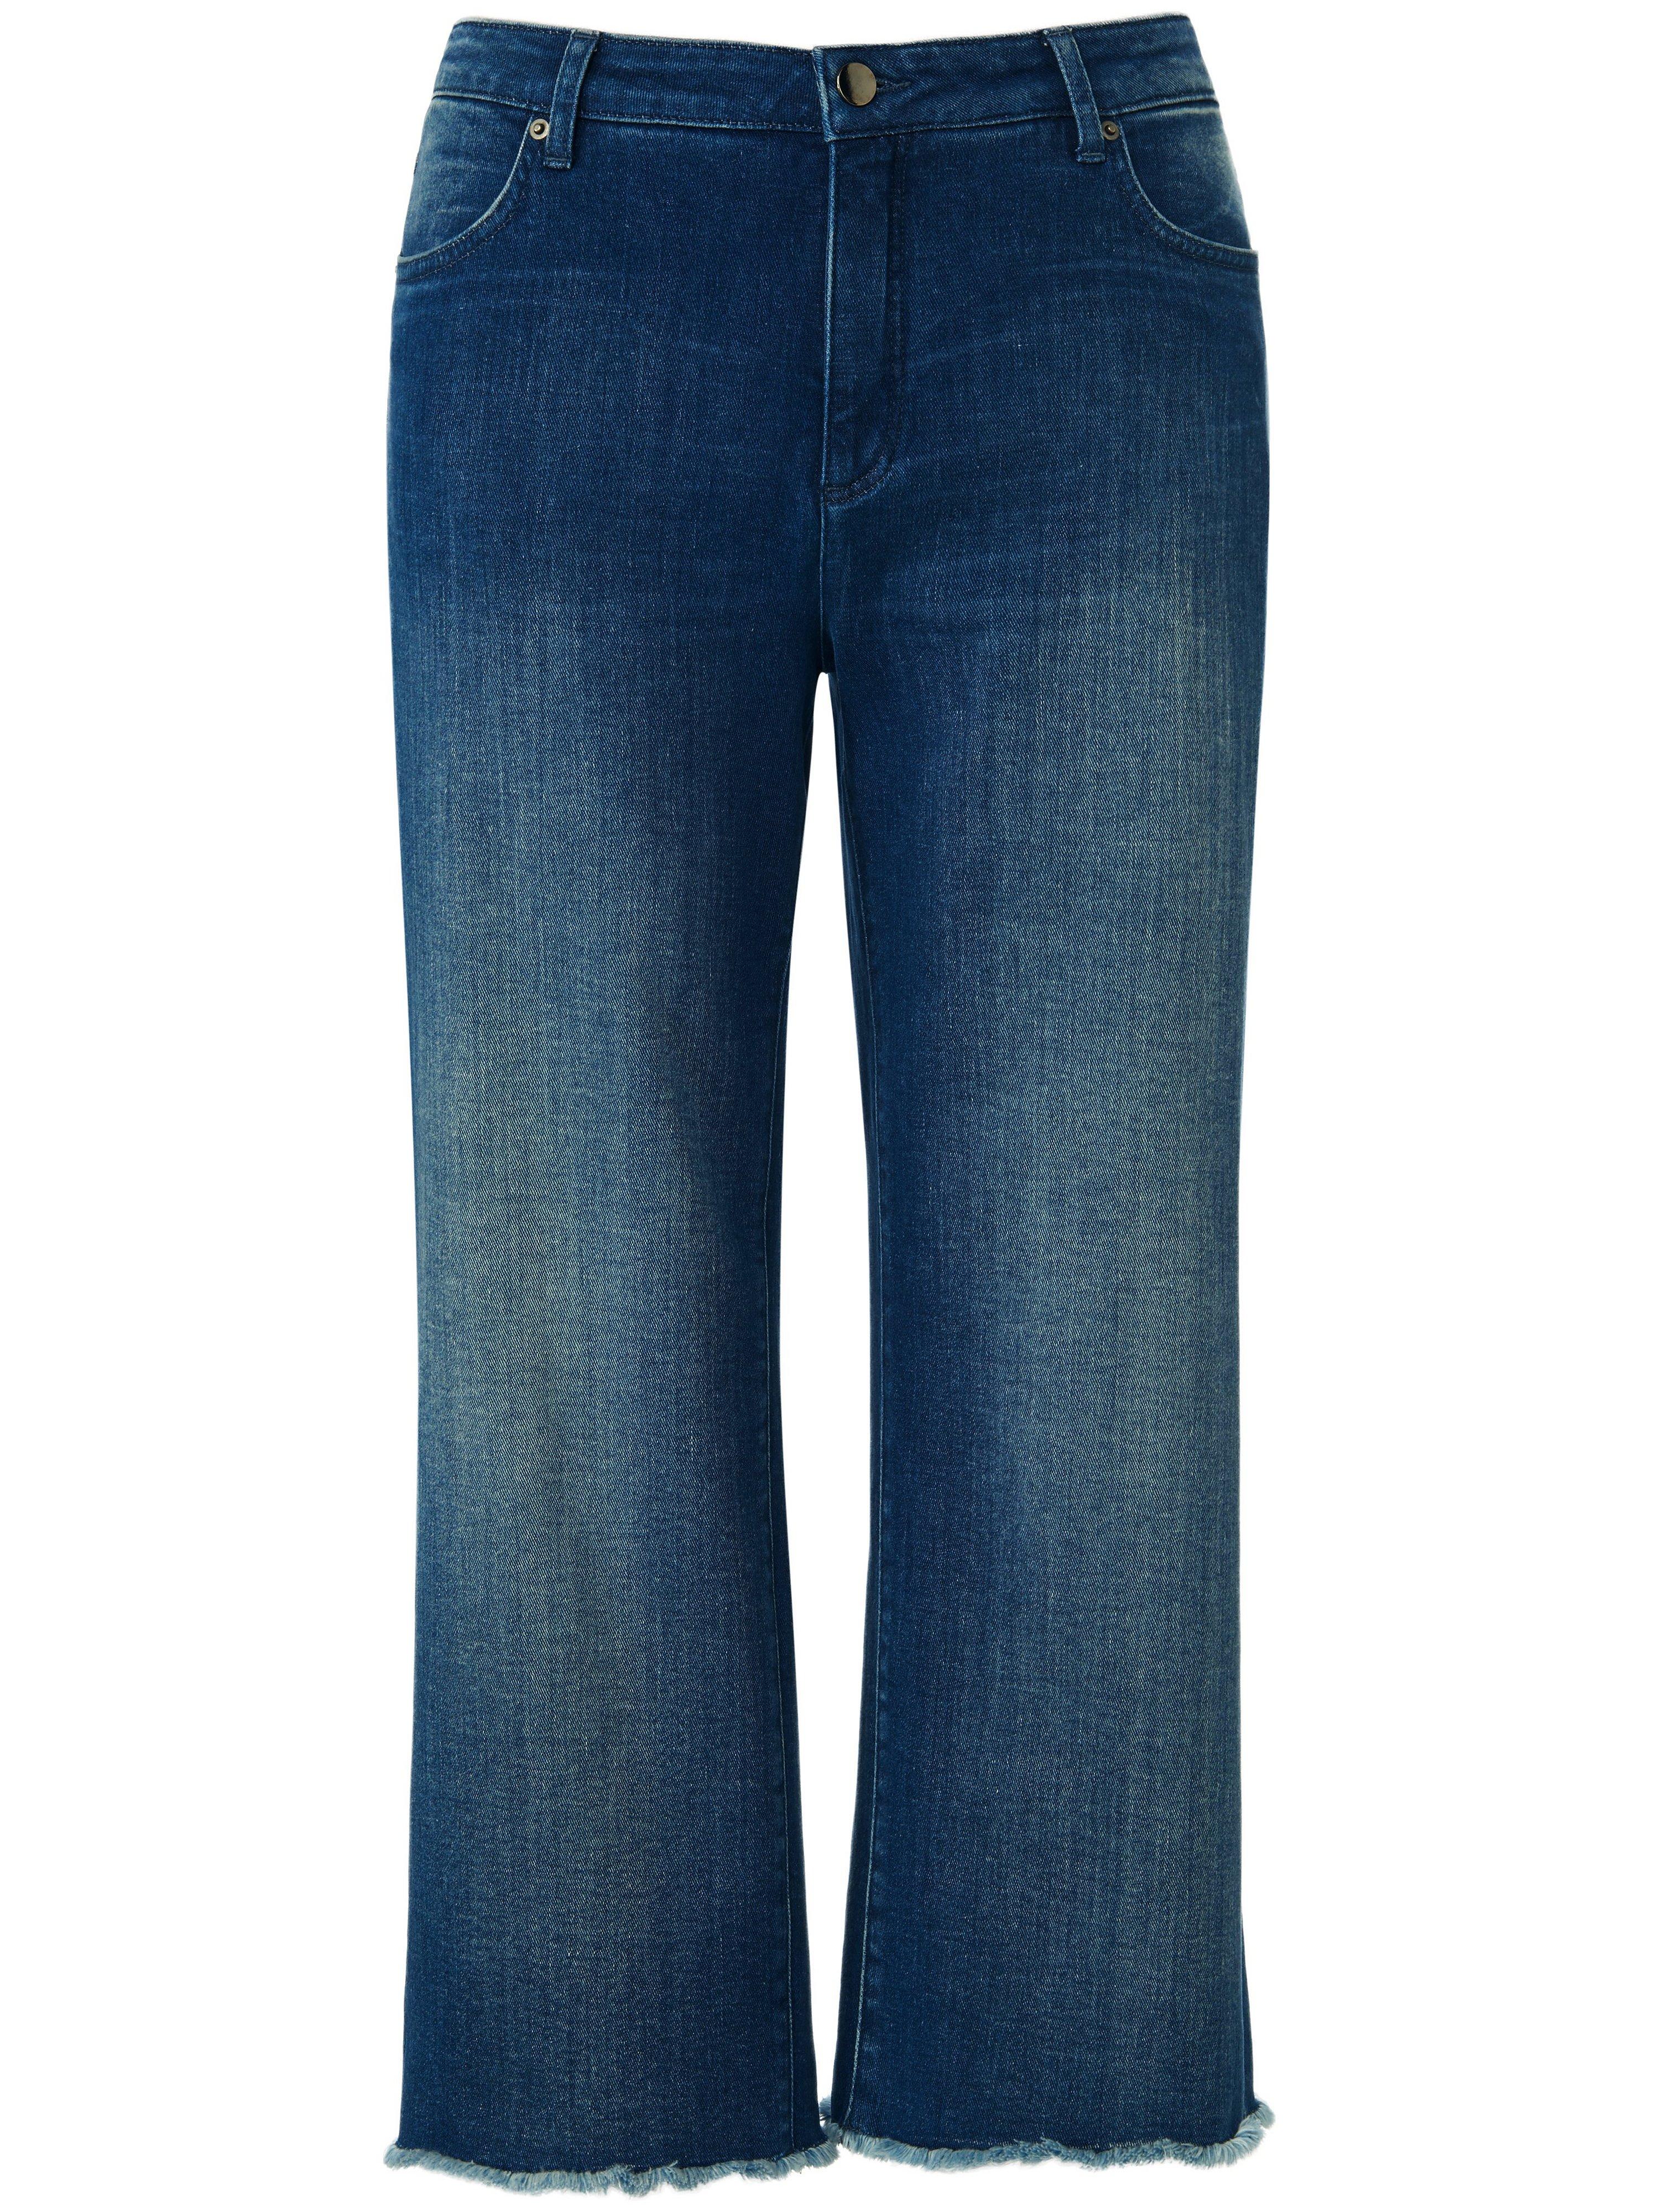 Jeansbroekrok 5-pocketsstijl Van Emilia Lay denim